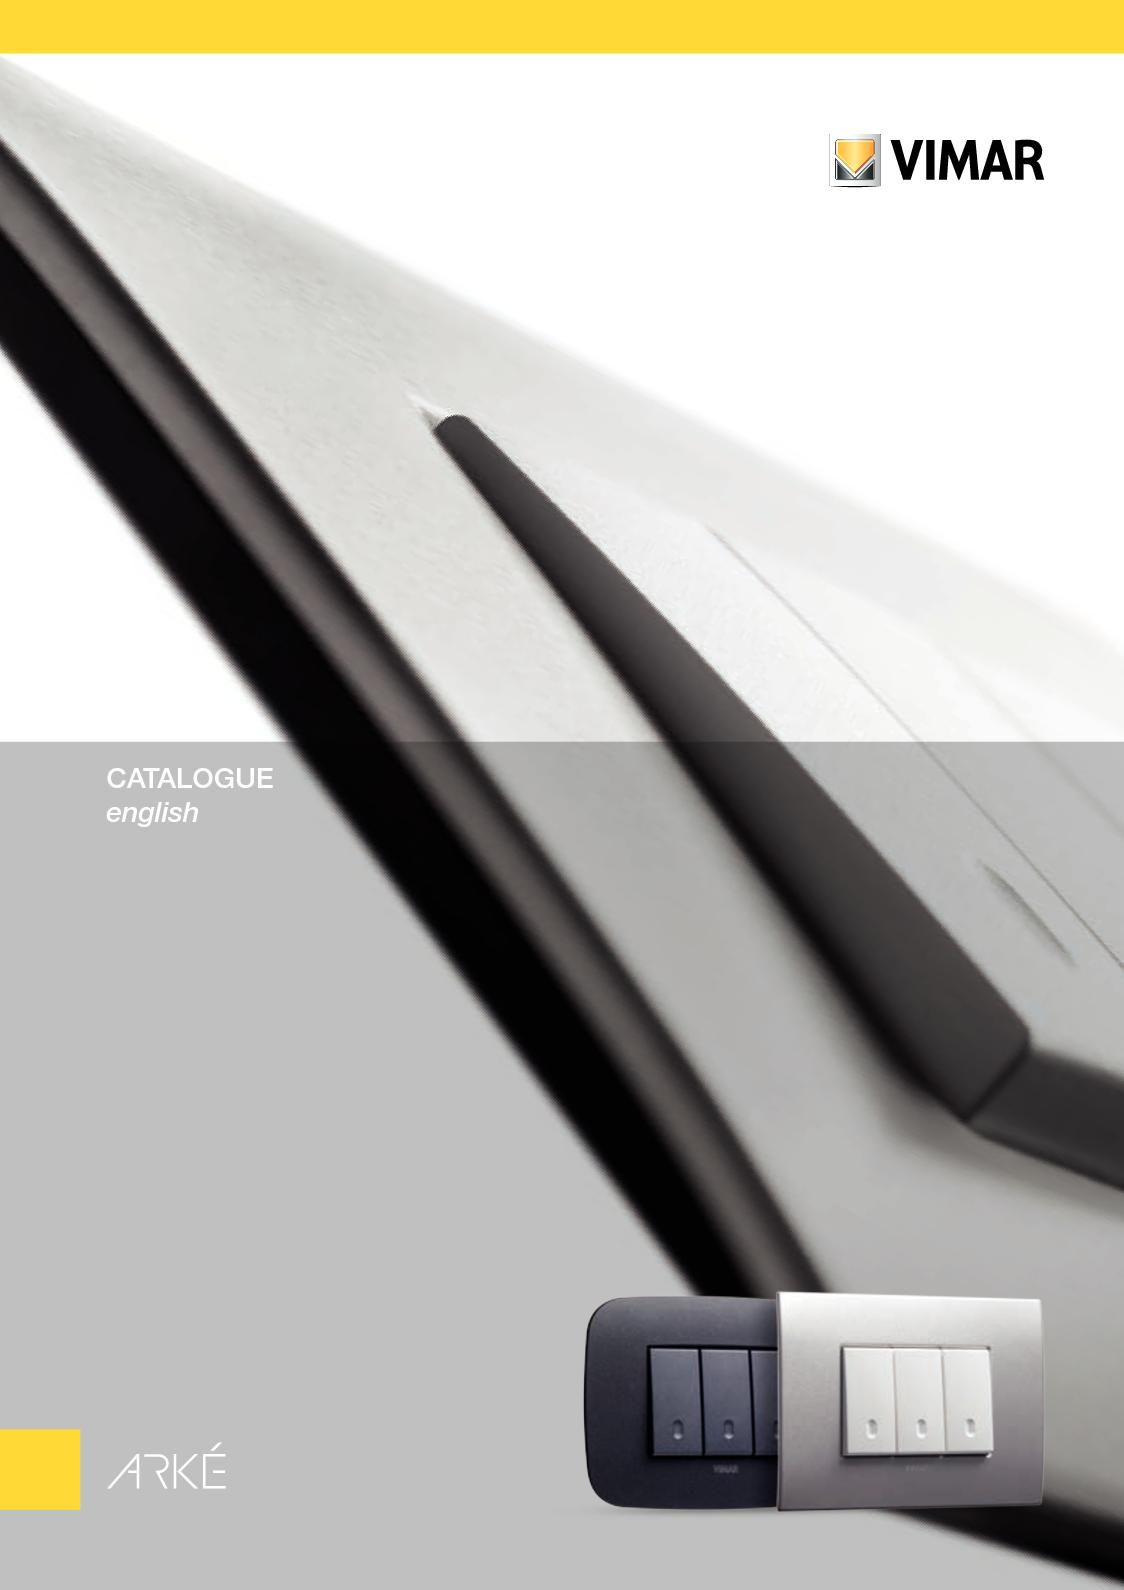 Calamo Arke Catalog Vimar 4 Way Switch